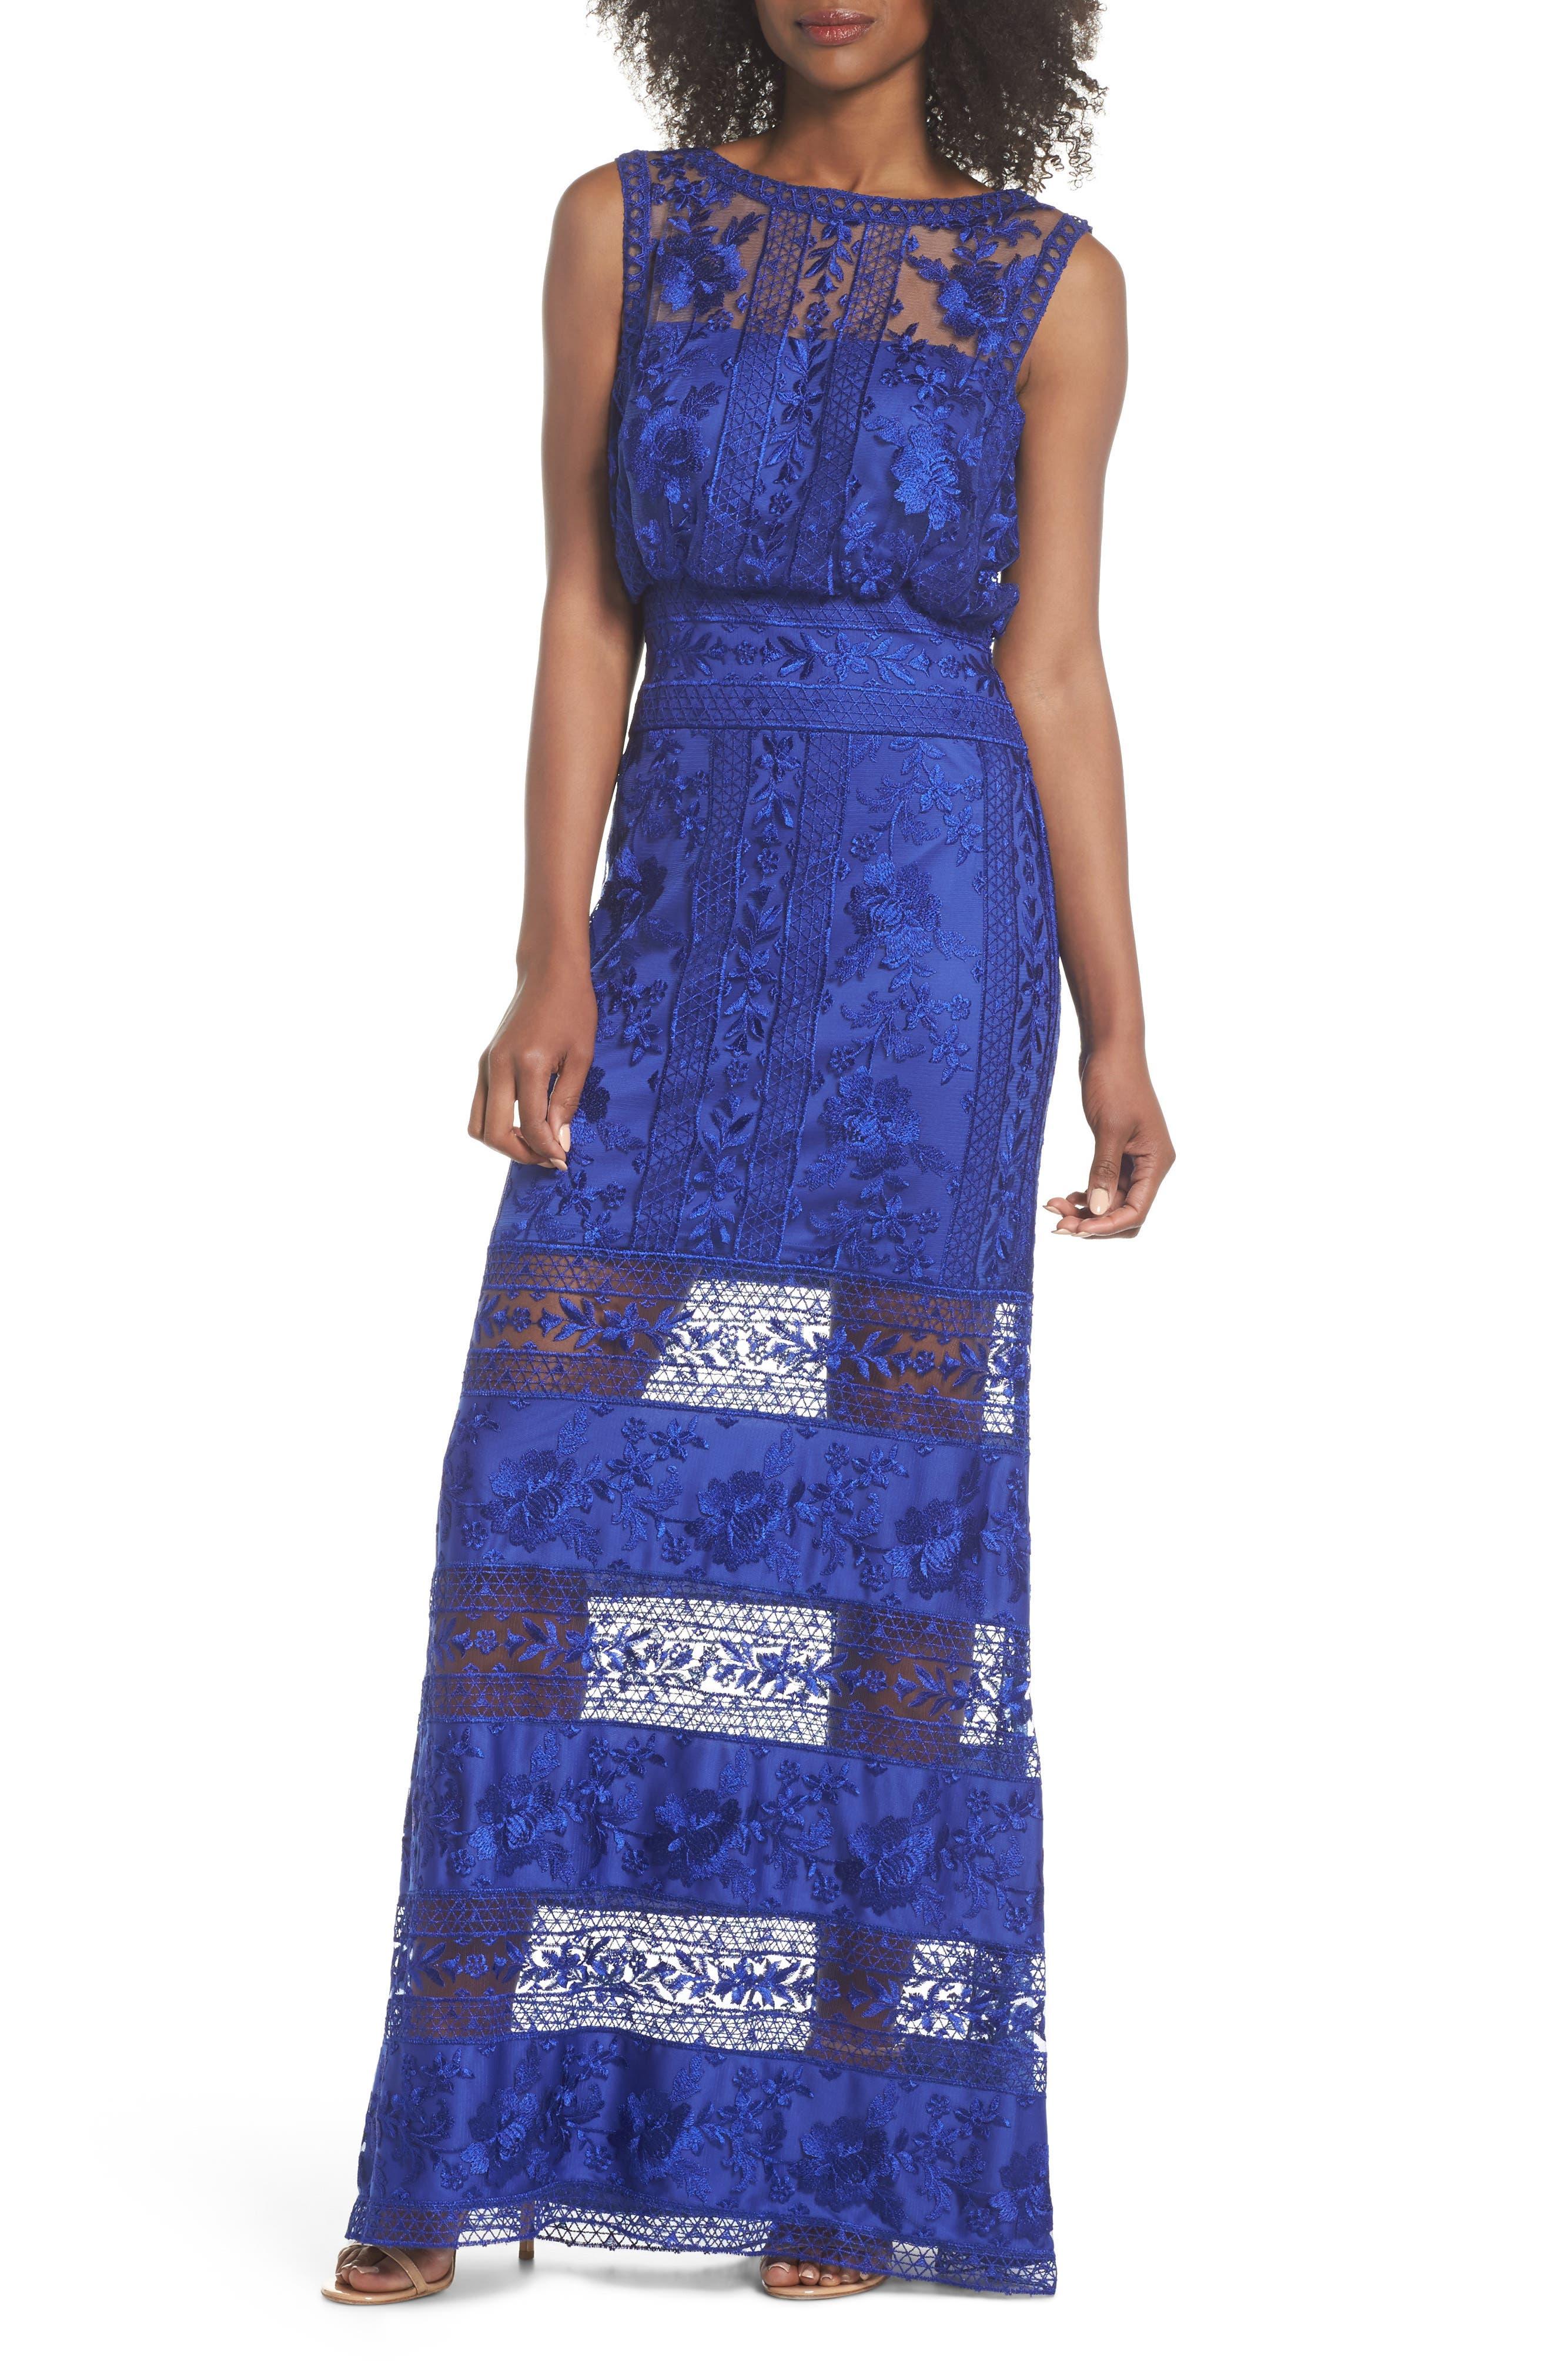 Alternate Image 1 Selected - Tadashi Shoji Kaisra Embroidered Lace Gown